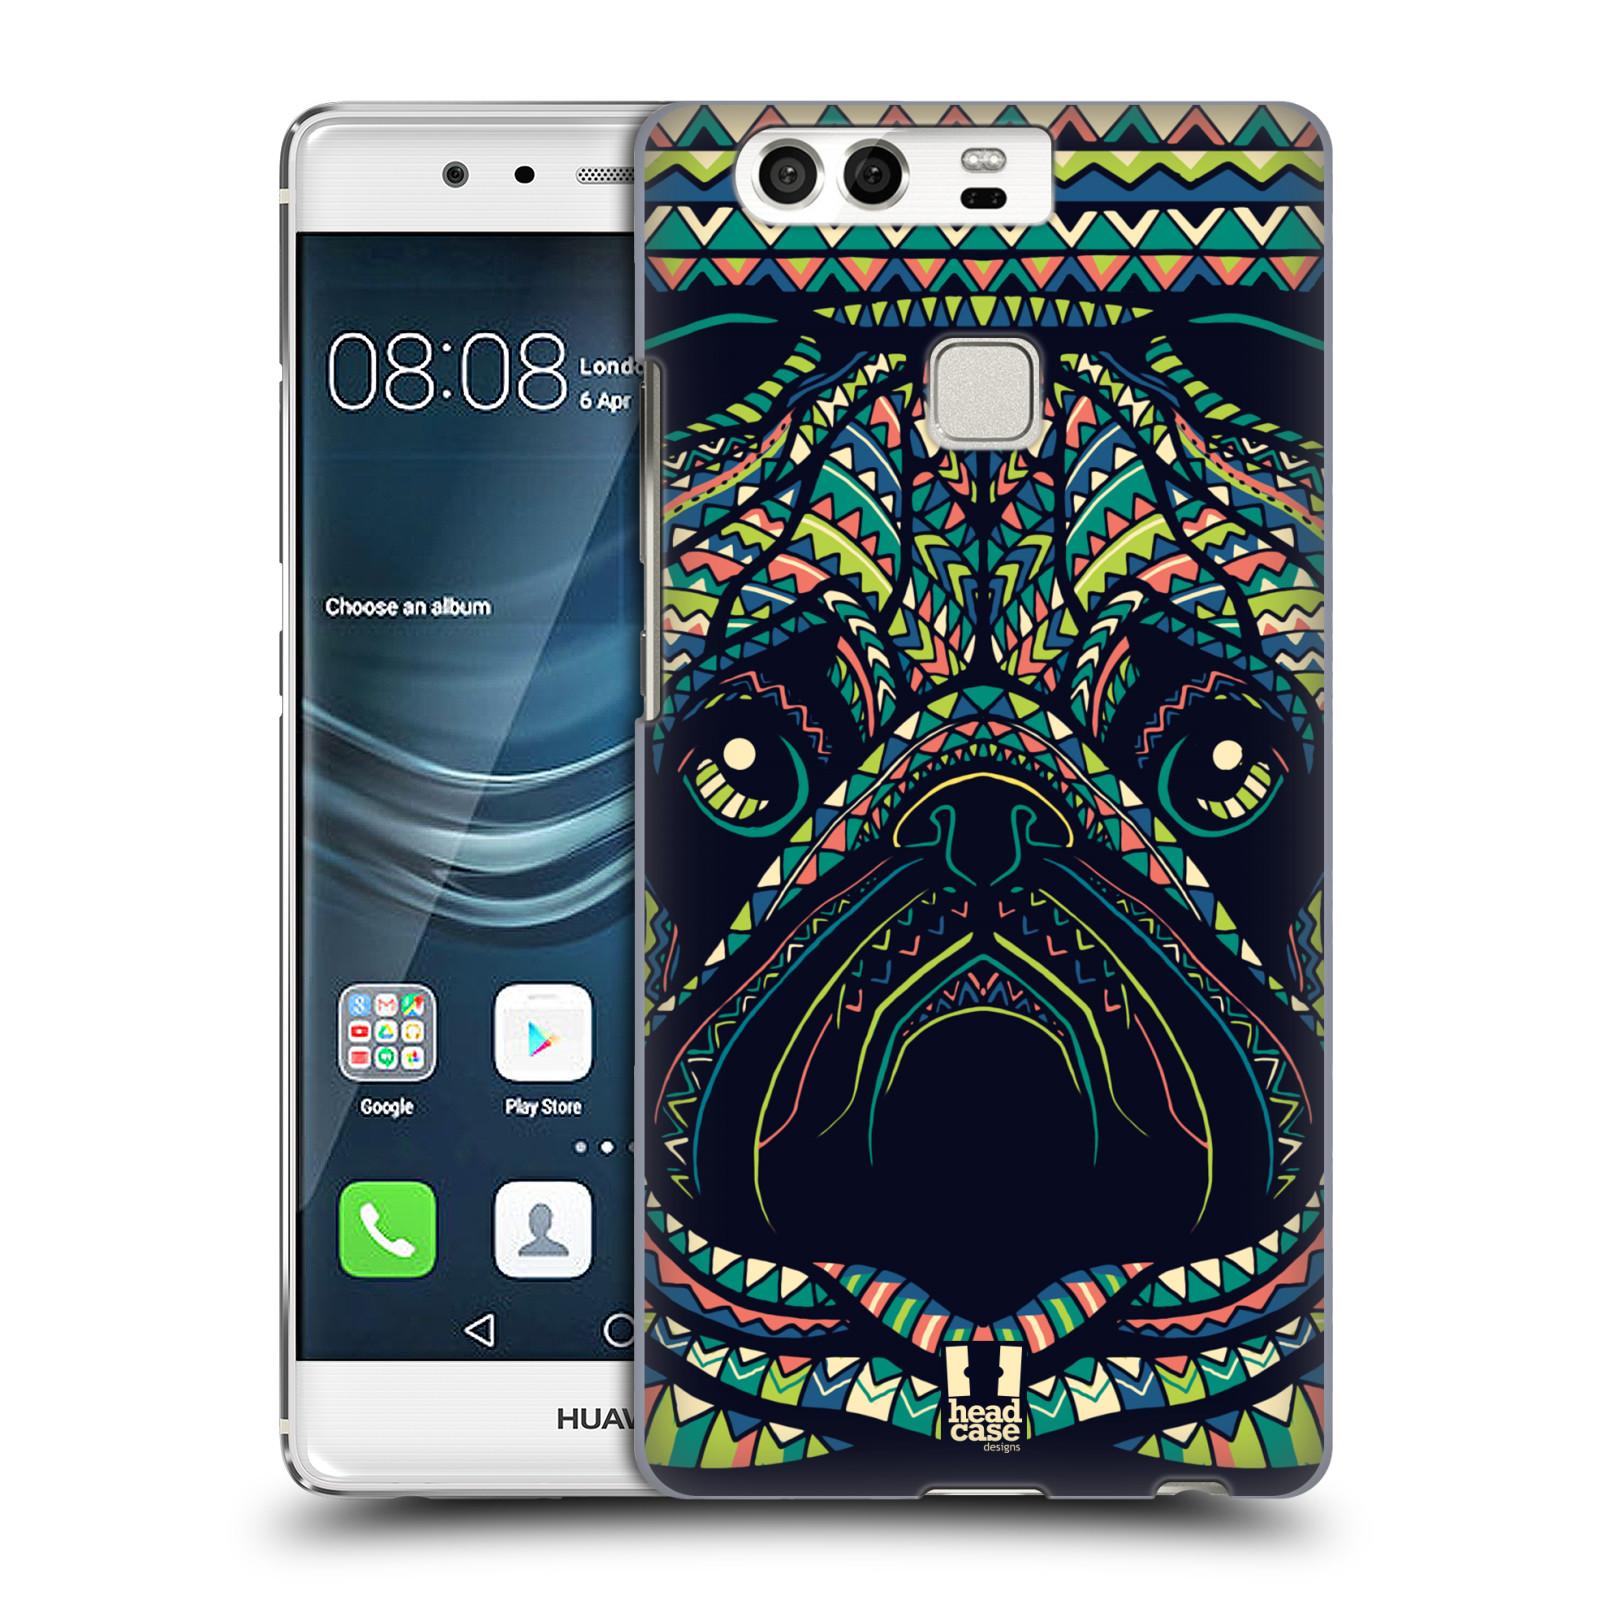 HEAD CASE plastový obal na mobil Huawei P9 / P9 DUAL SIM vzor Aztécký motiv zvíře 3 mopsík